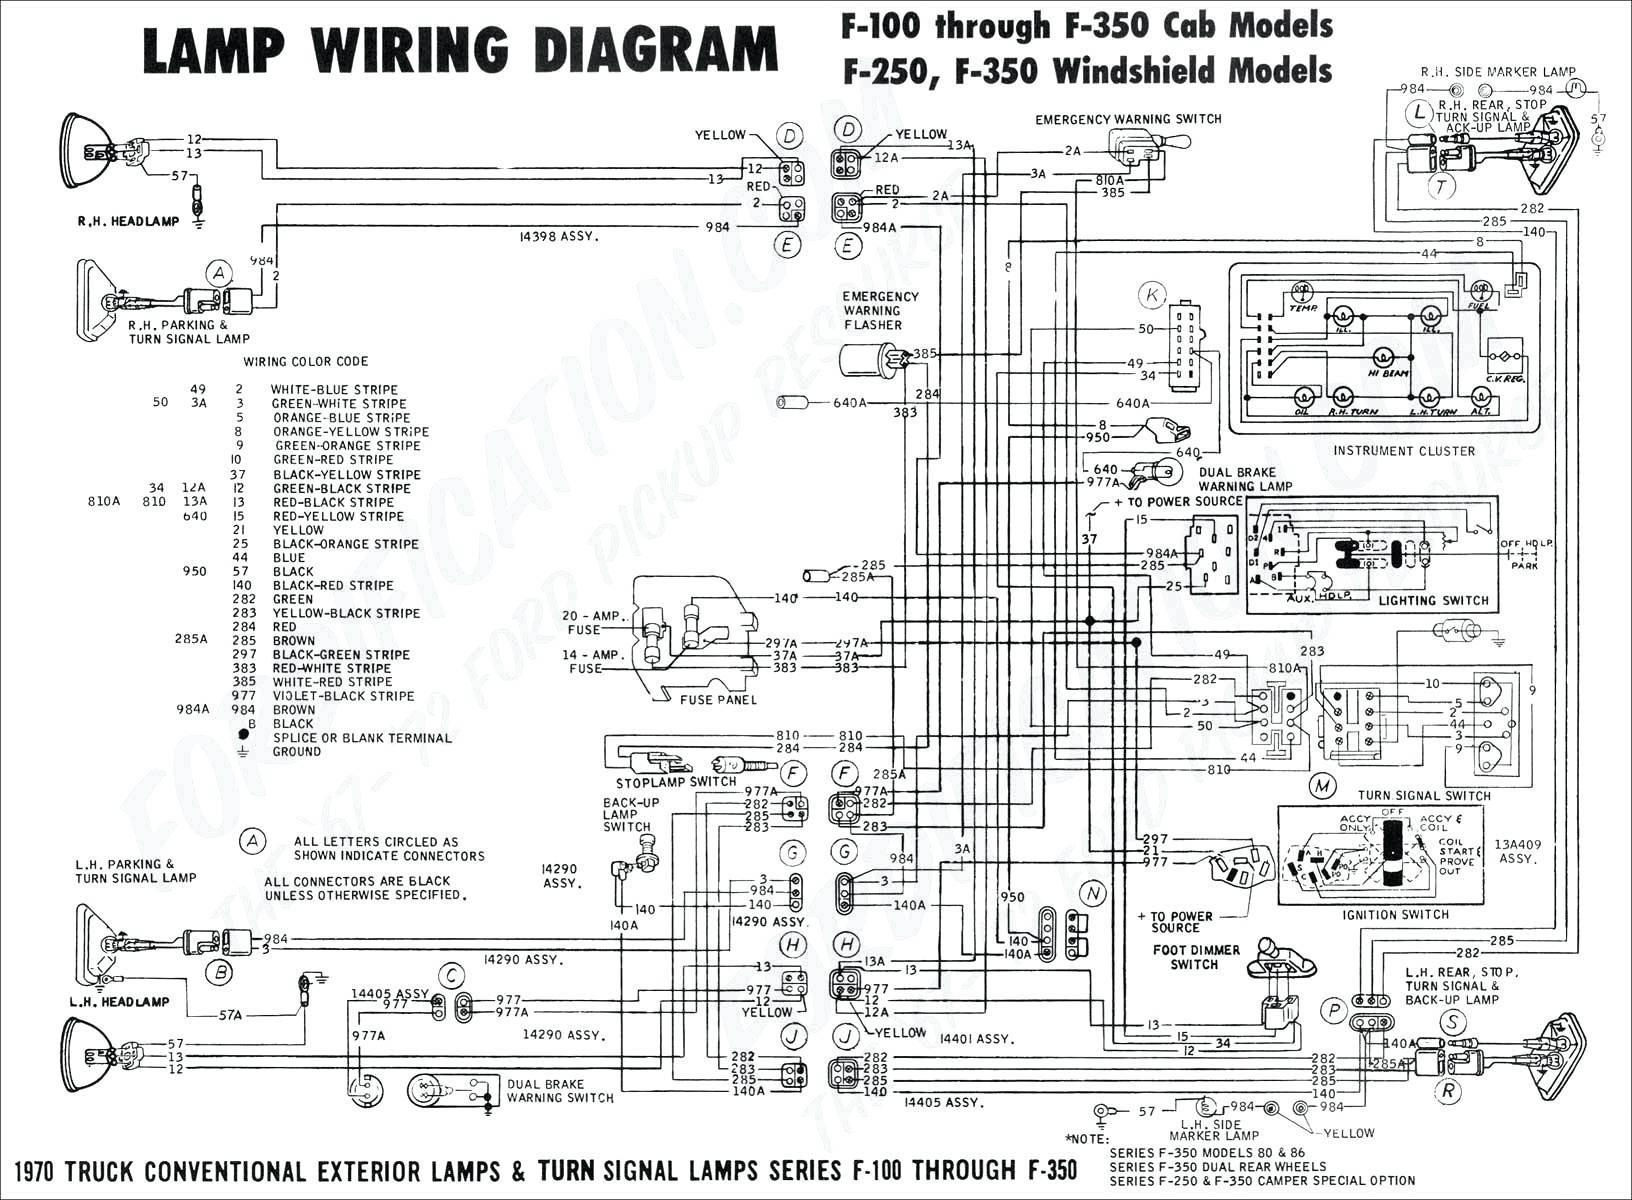 Car Security System Wiring Diagram Delphi Remote Start Wiring Diagram Of Car Security System Wiring Diagram